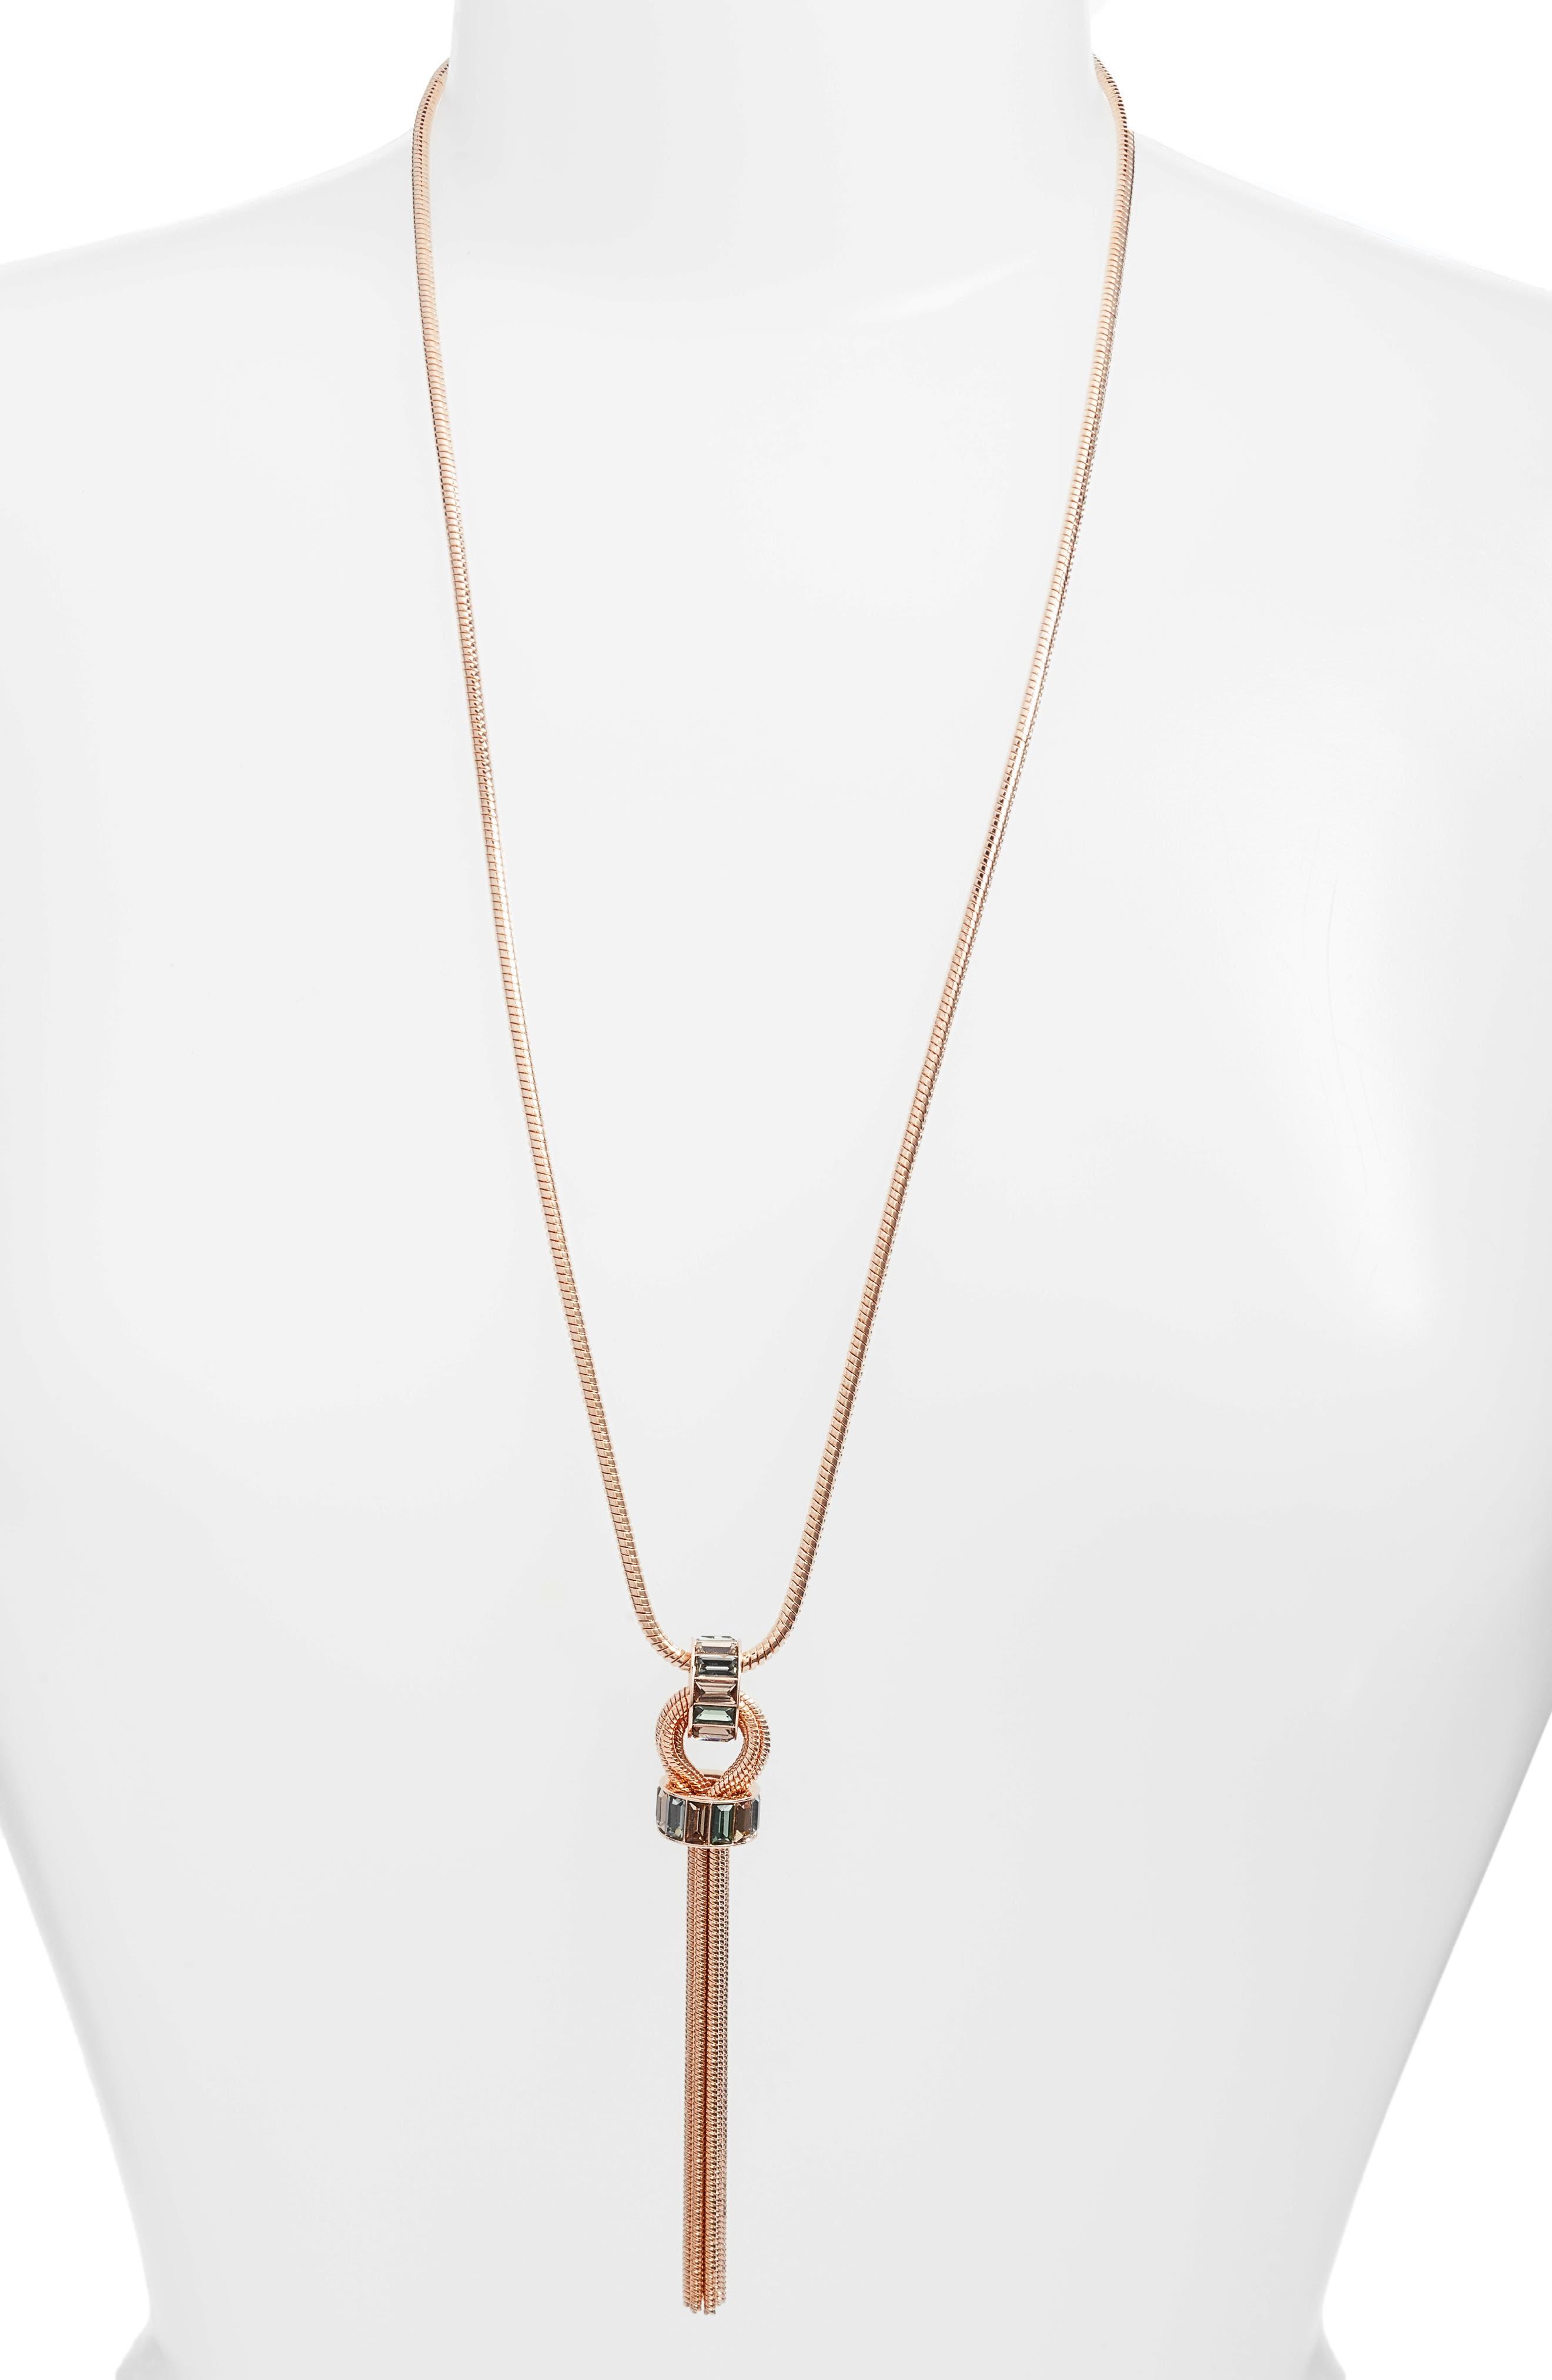 Vince Camuto Tassel Necklace